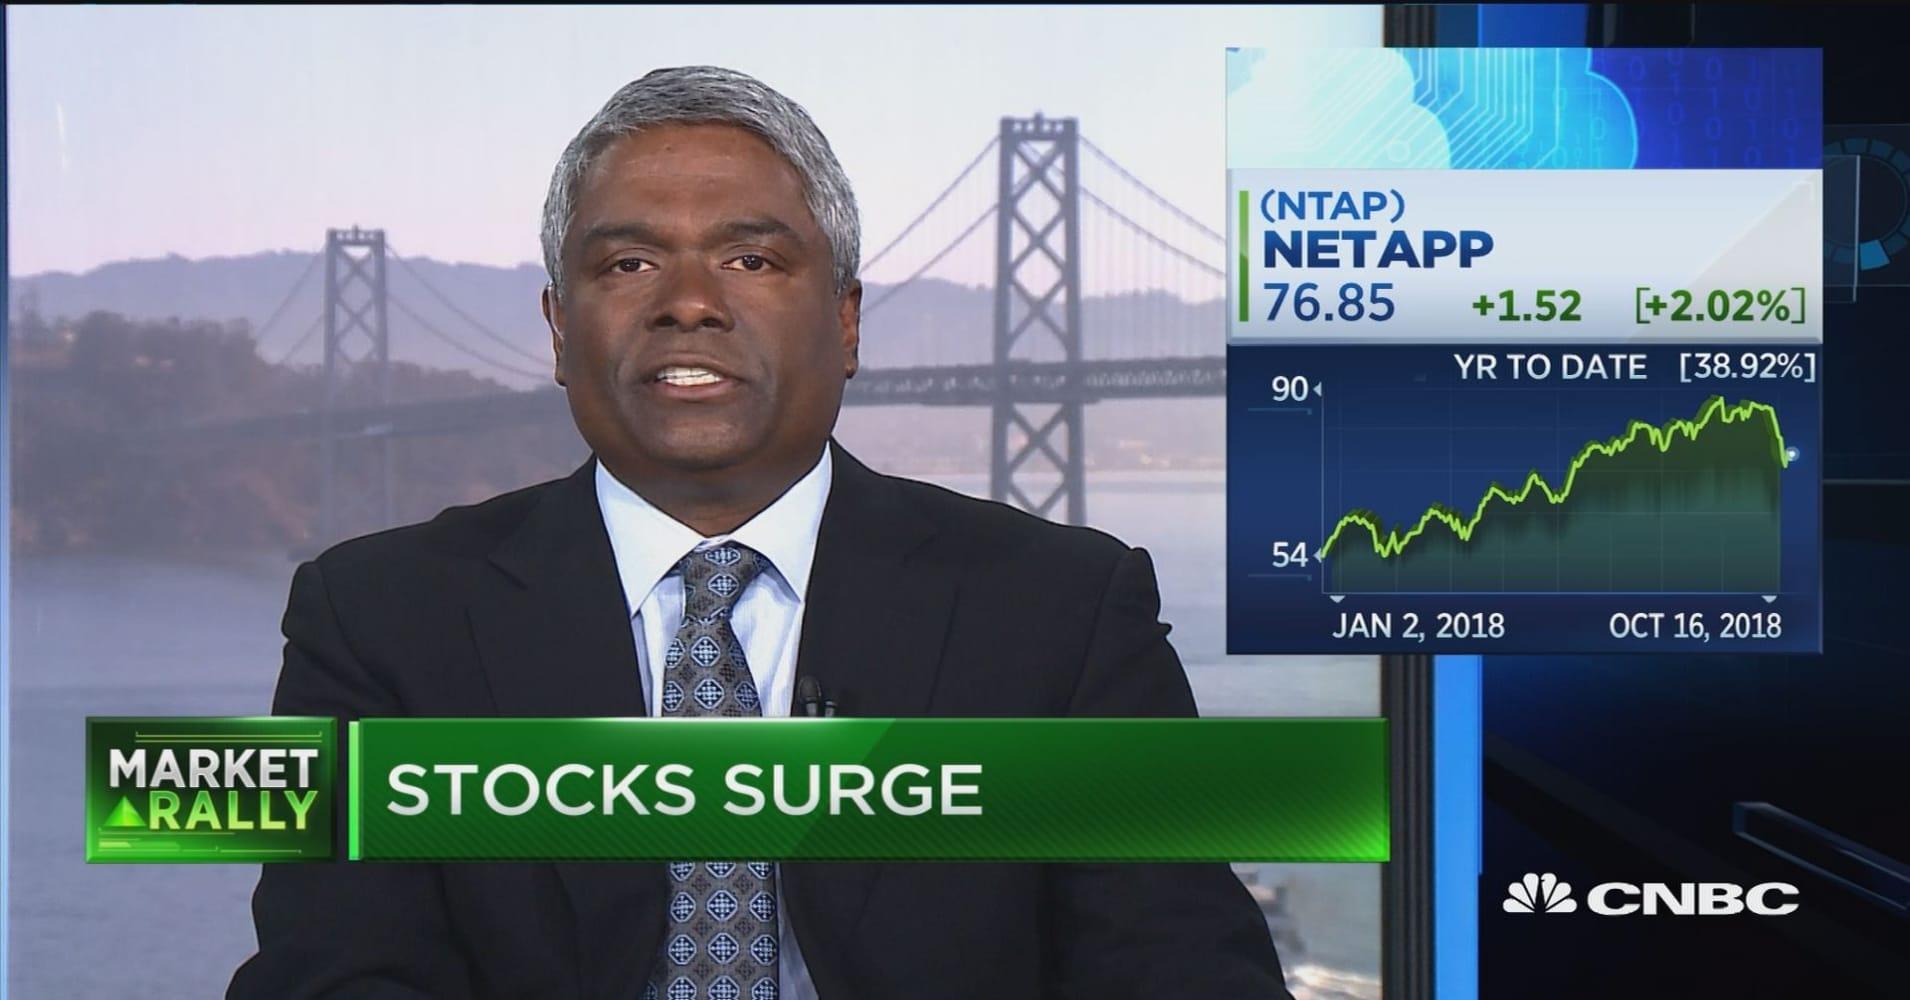 NetApp CEO on data-driven future